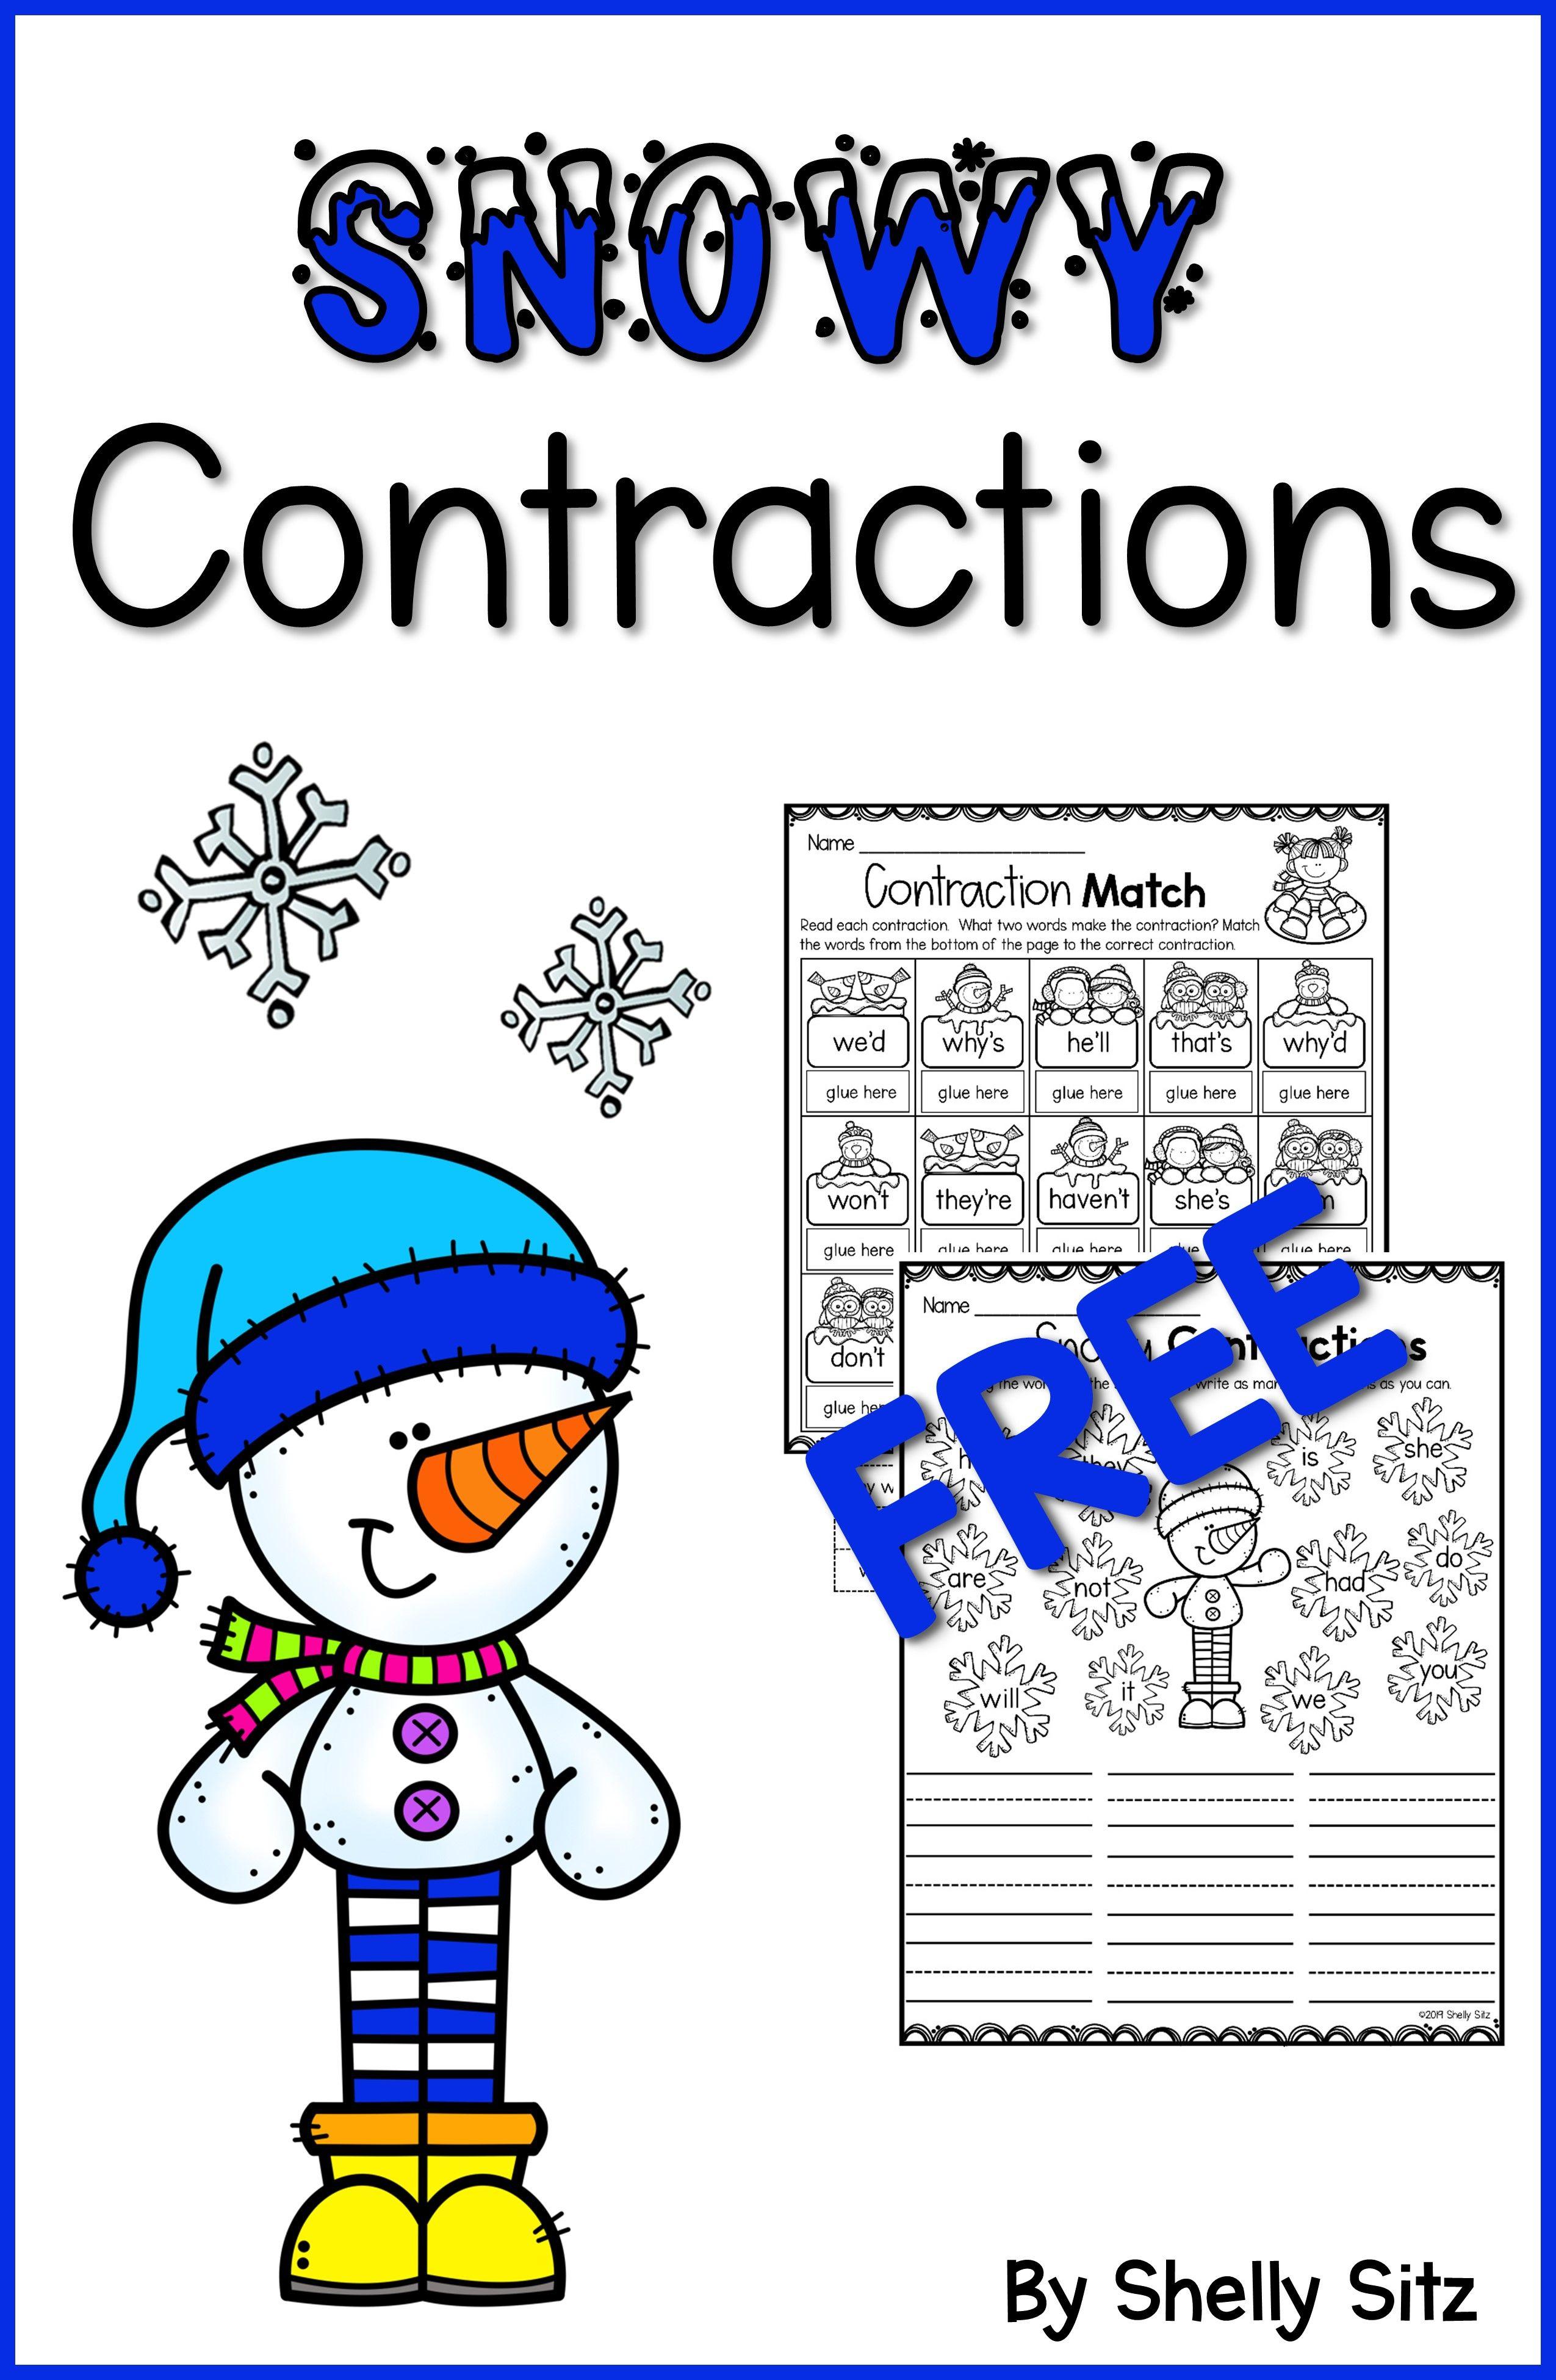 medium resolution of Contraction Worksheet   Contraction worksheet